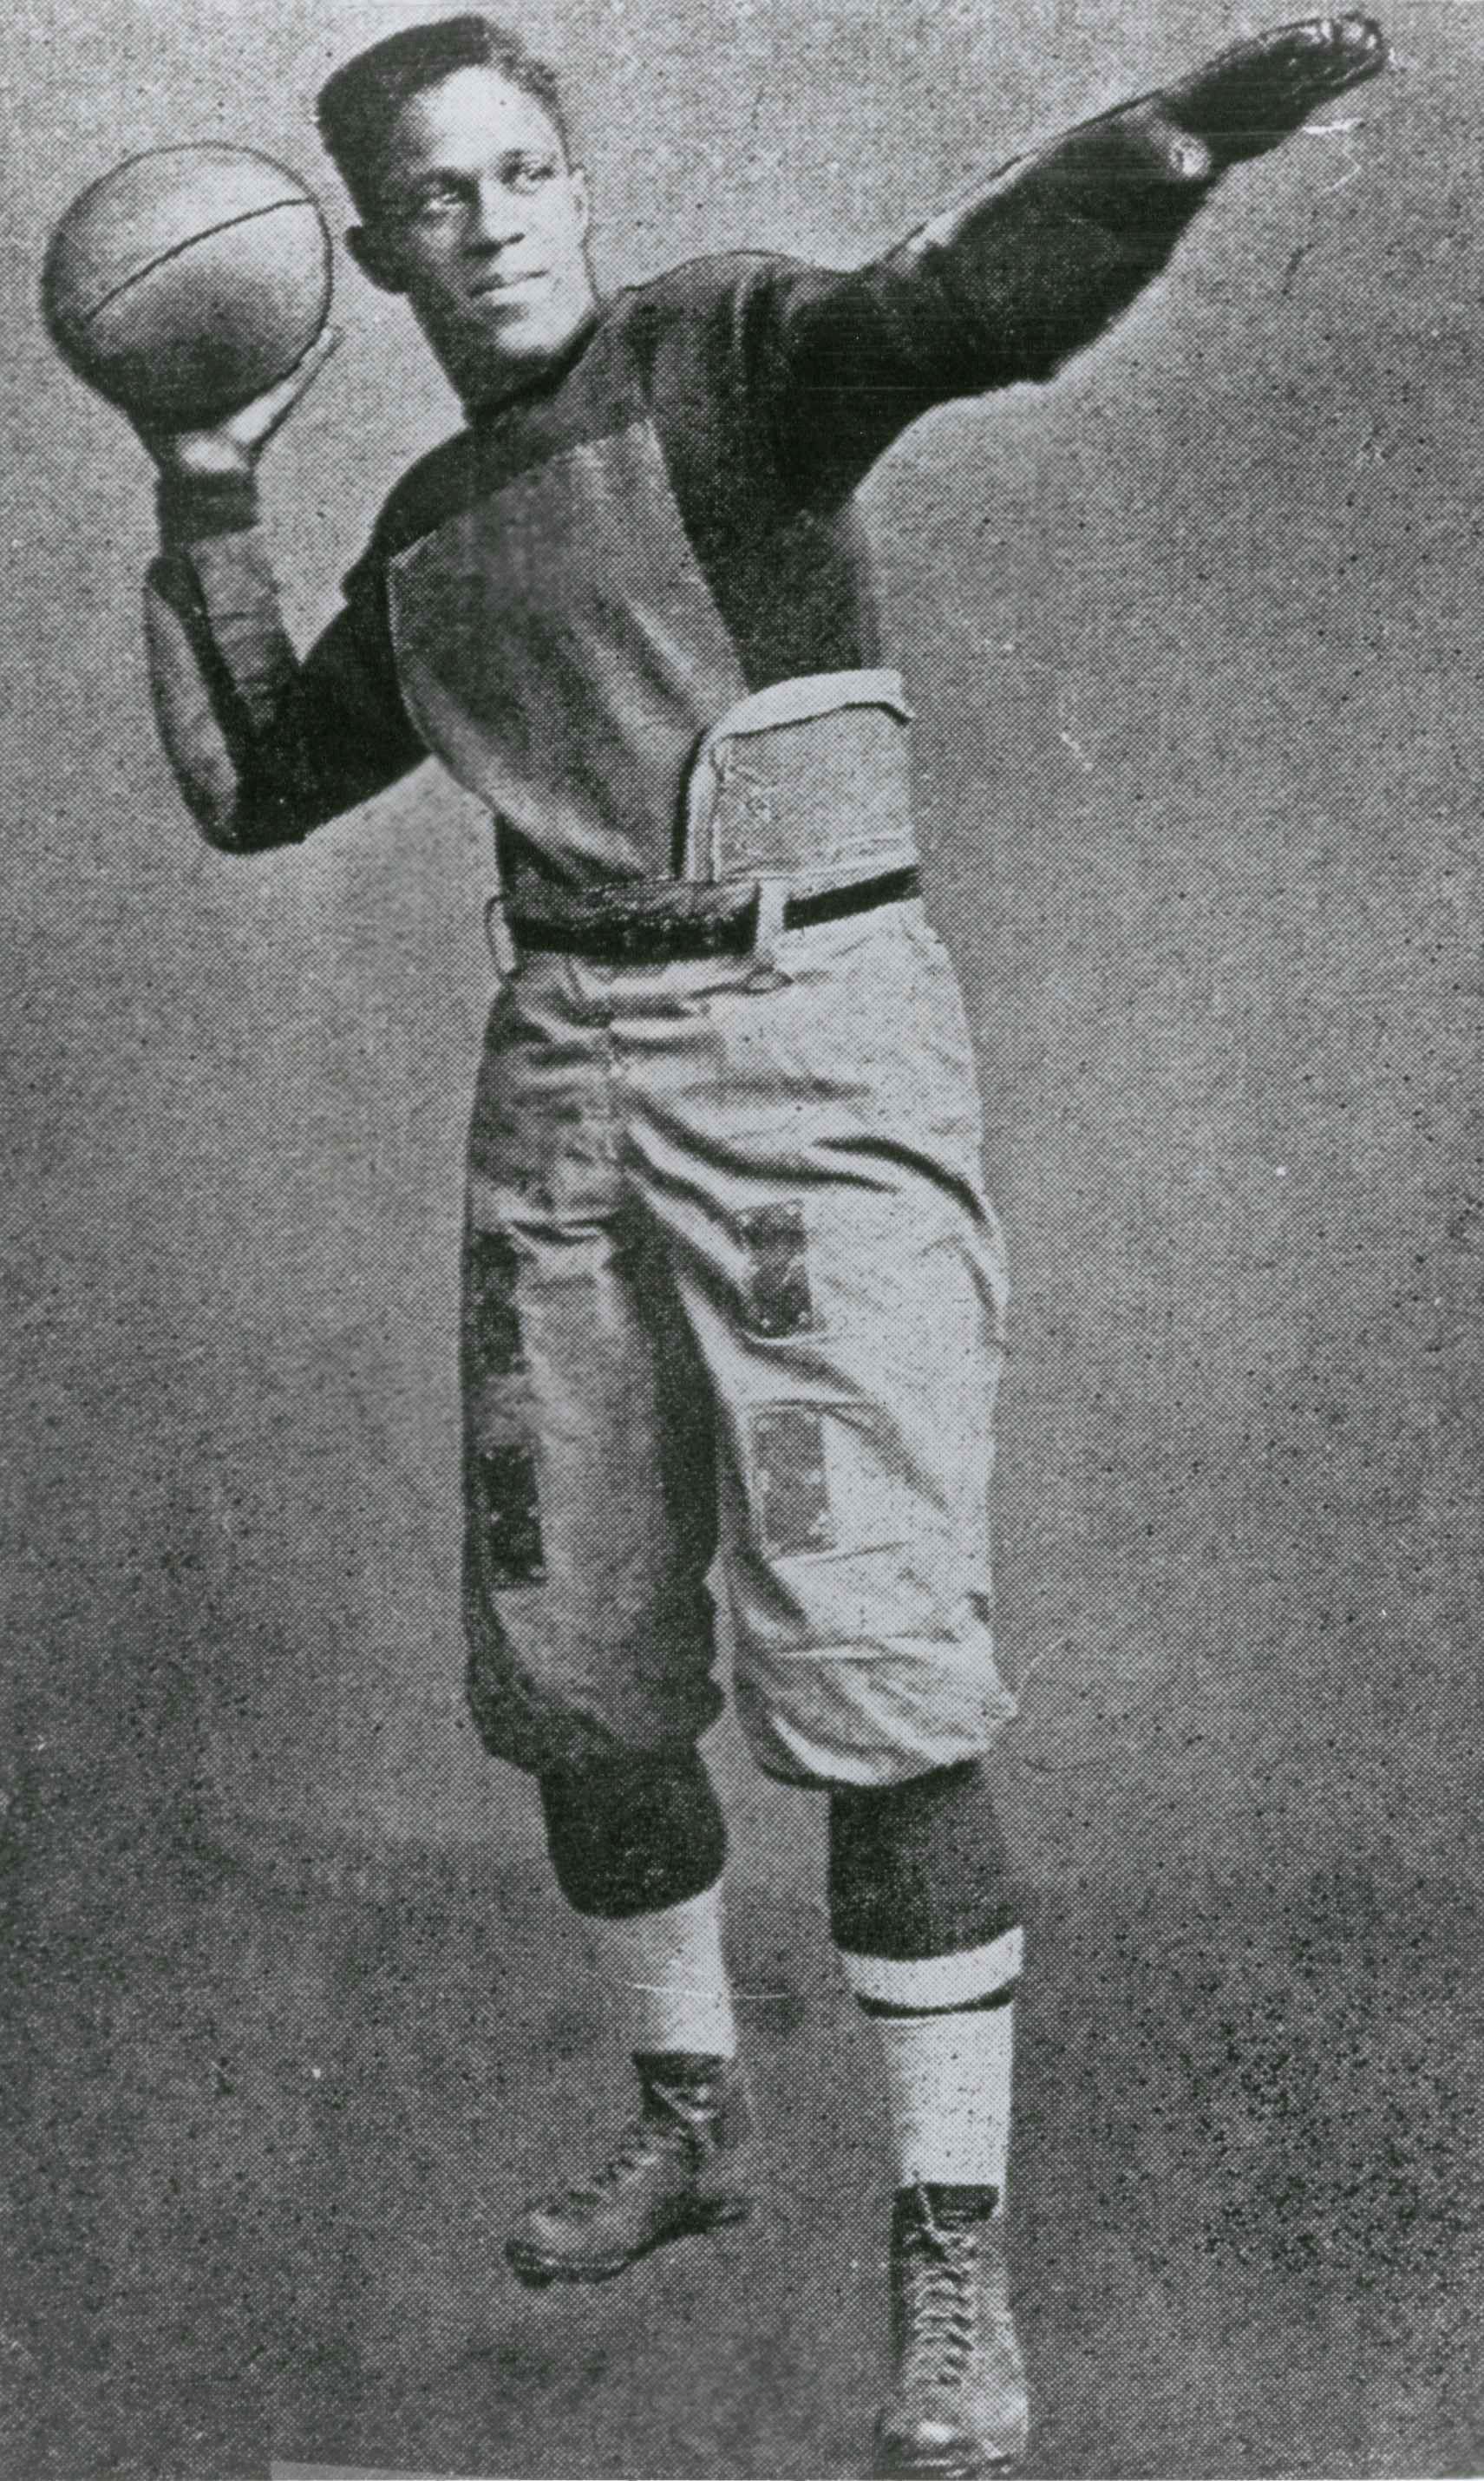 Fritz Pollard throwing football